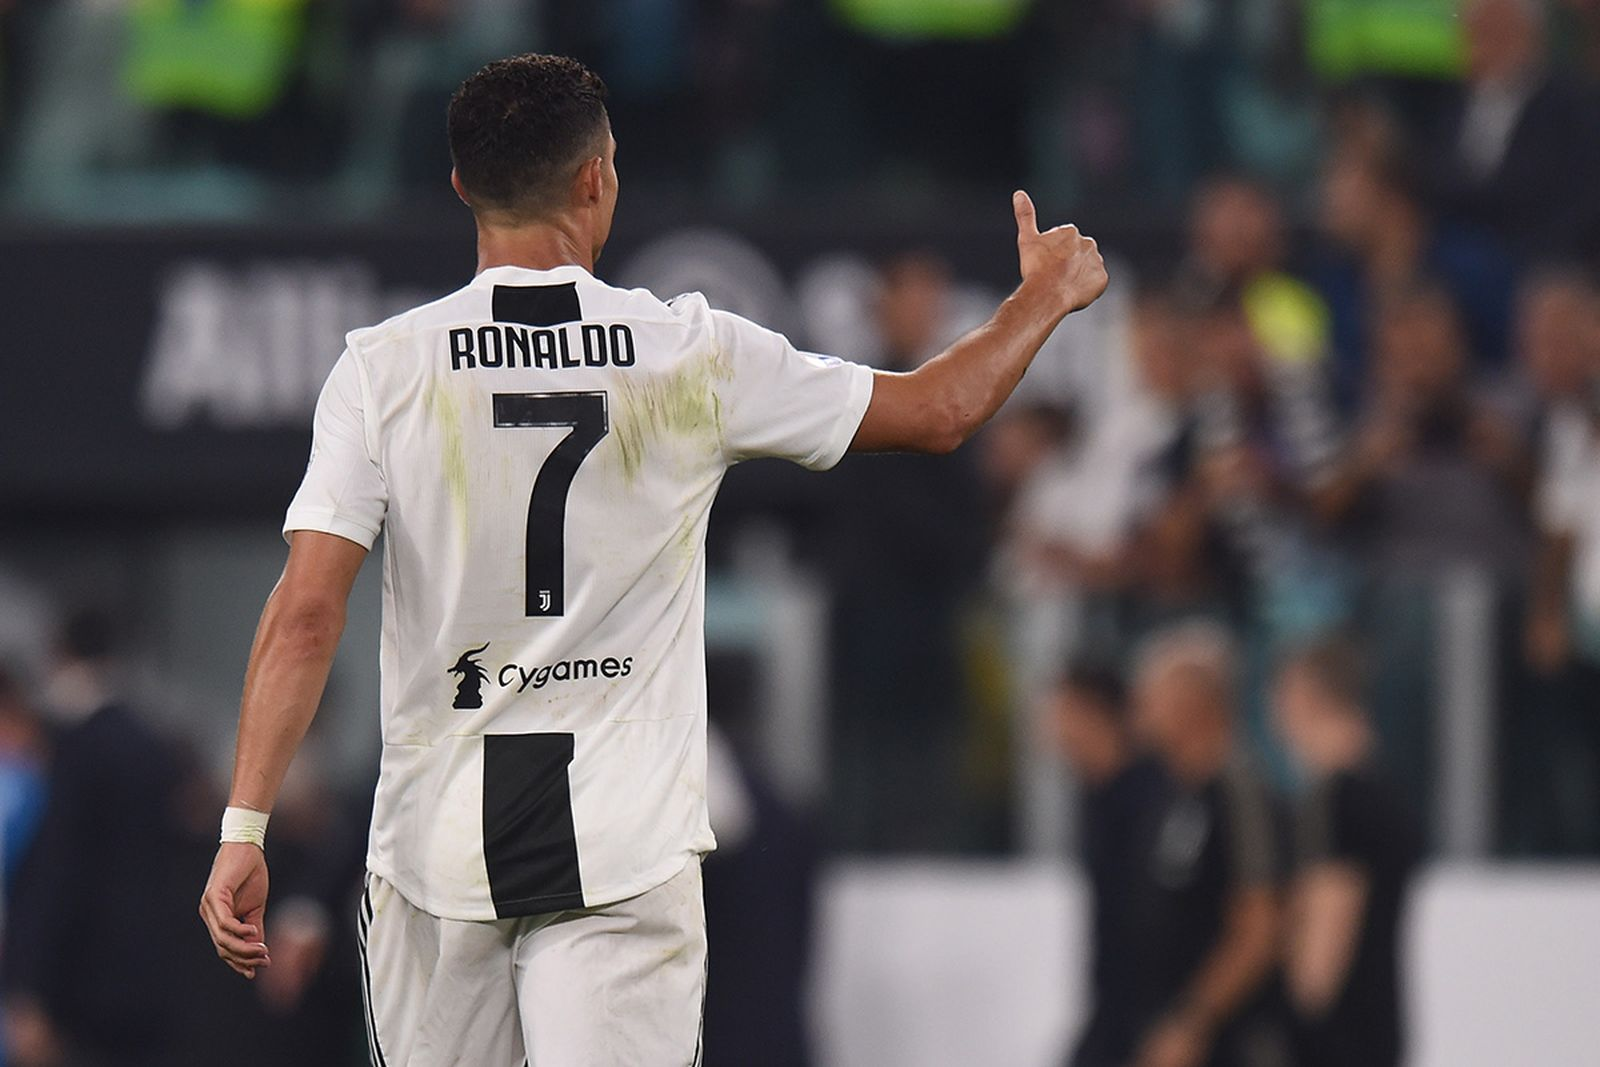 ronaldo-instagram-earnings-01